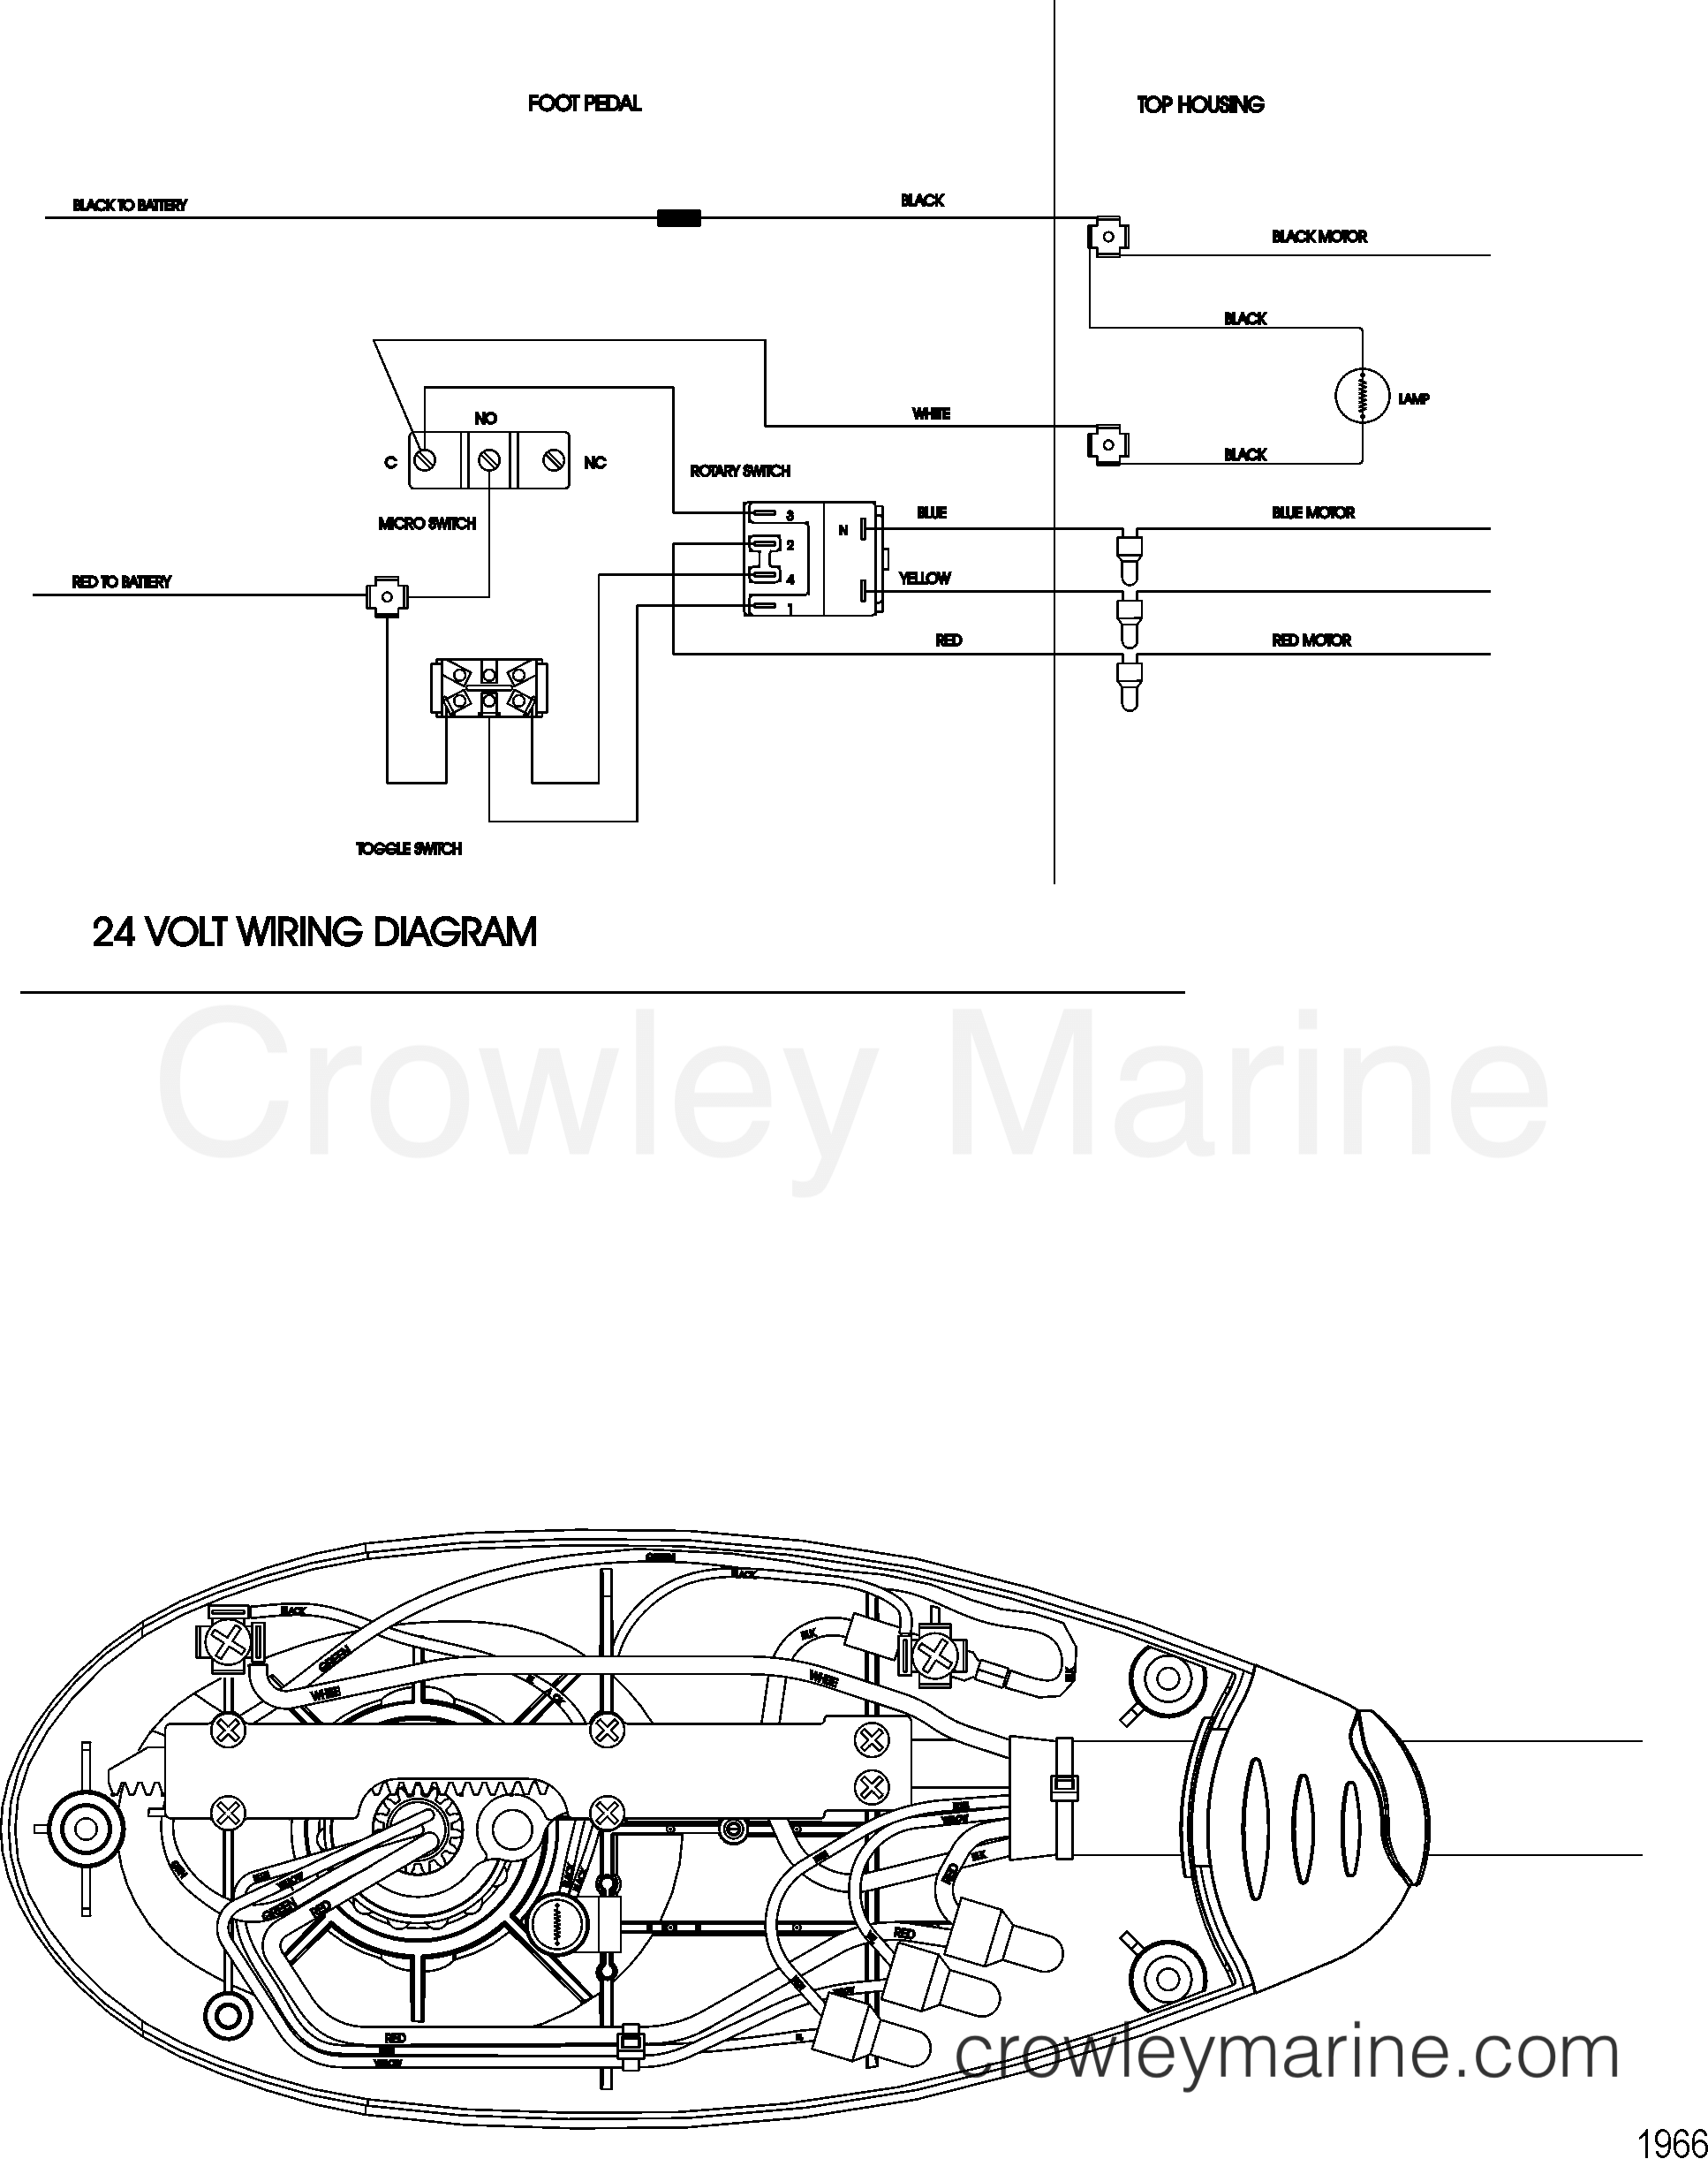 2005 MotorGuide 24V [MOTORGUIDE] - 923210020 WIRE DIAGRAM(MODEL FW60FB) section